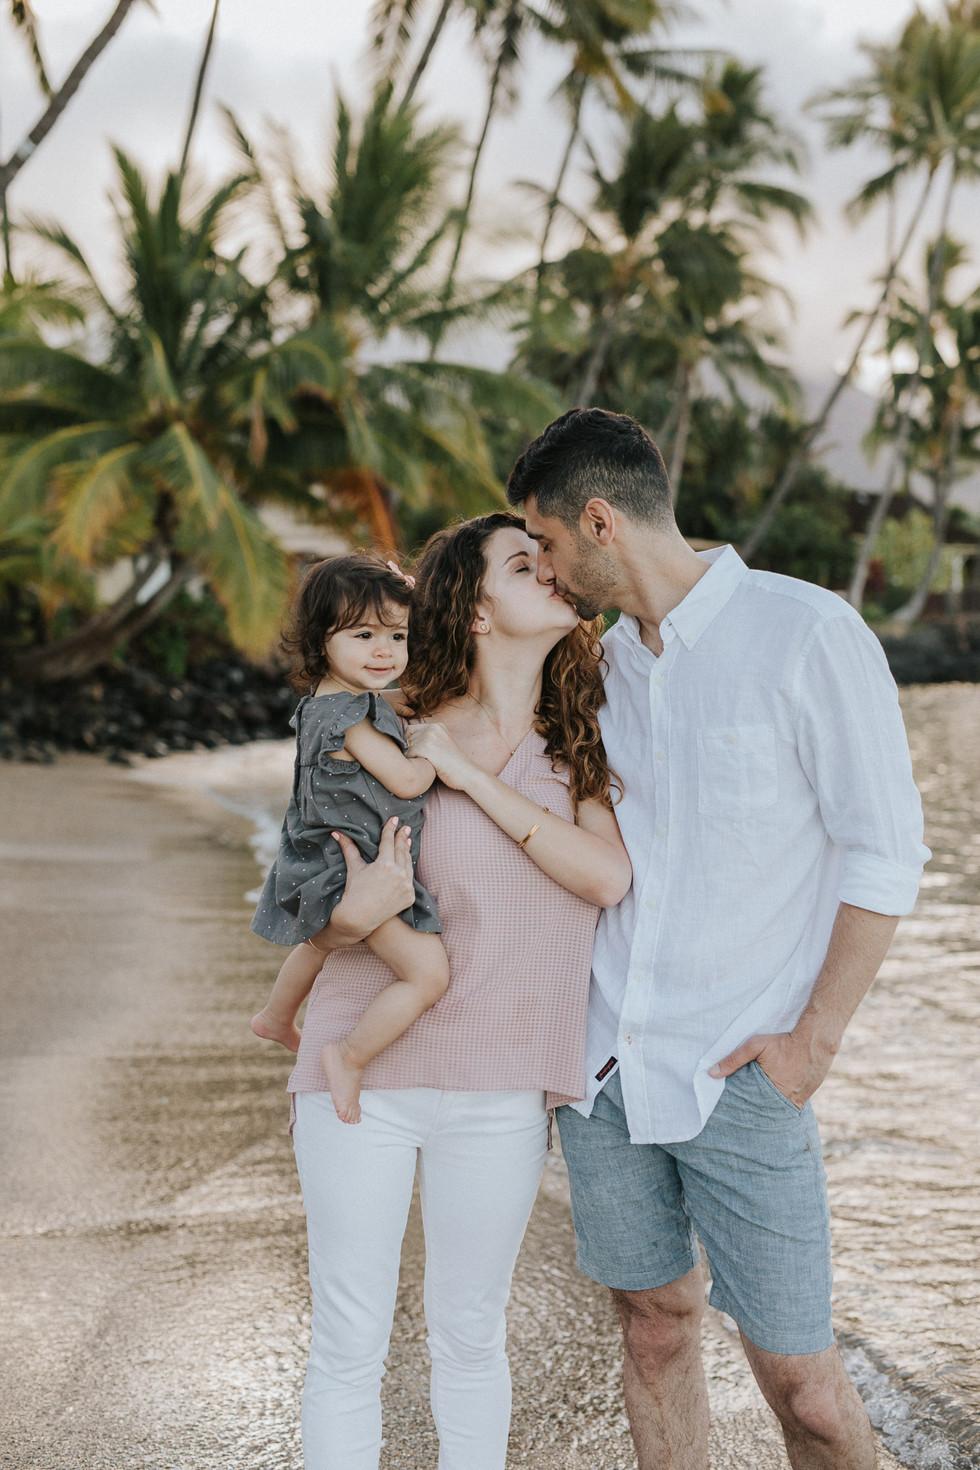 Maui Family Session in Lahaina | Marissa HB Photography